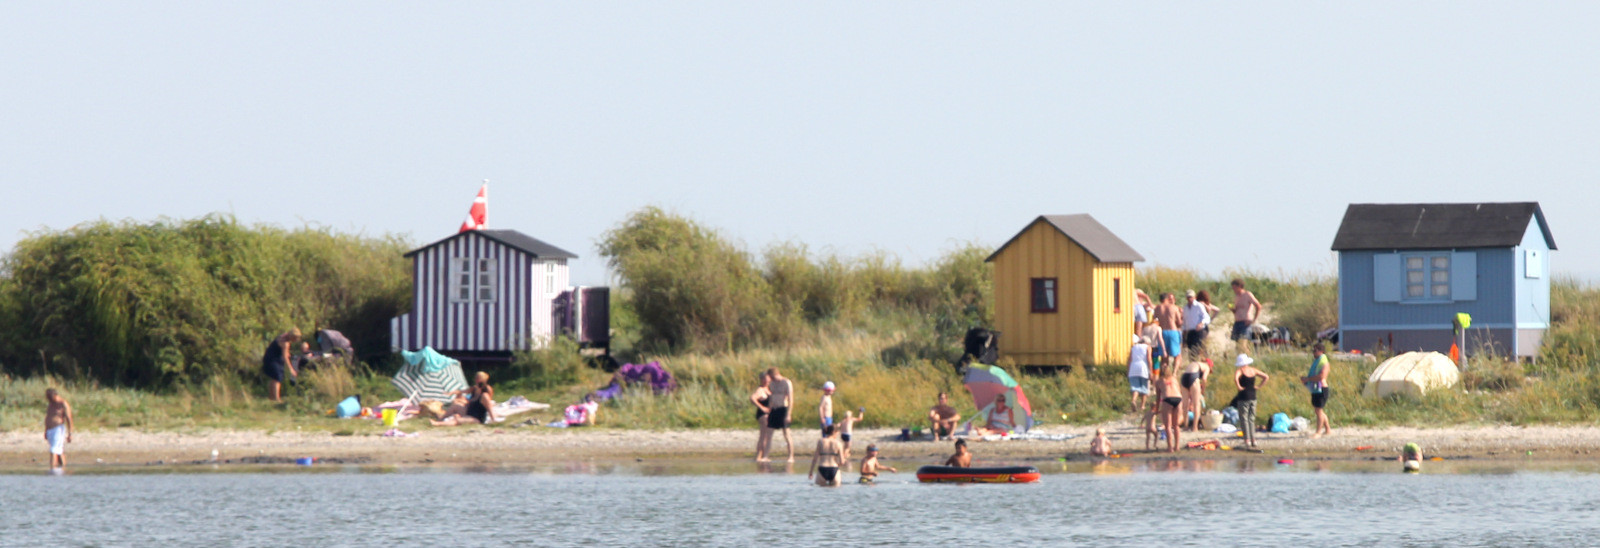 Øhavsstien på Ærø